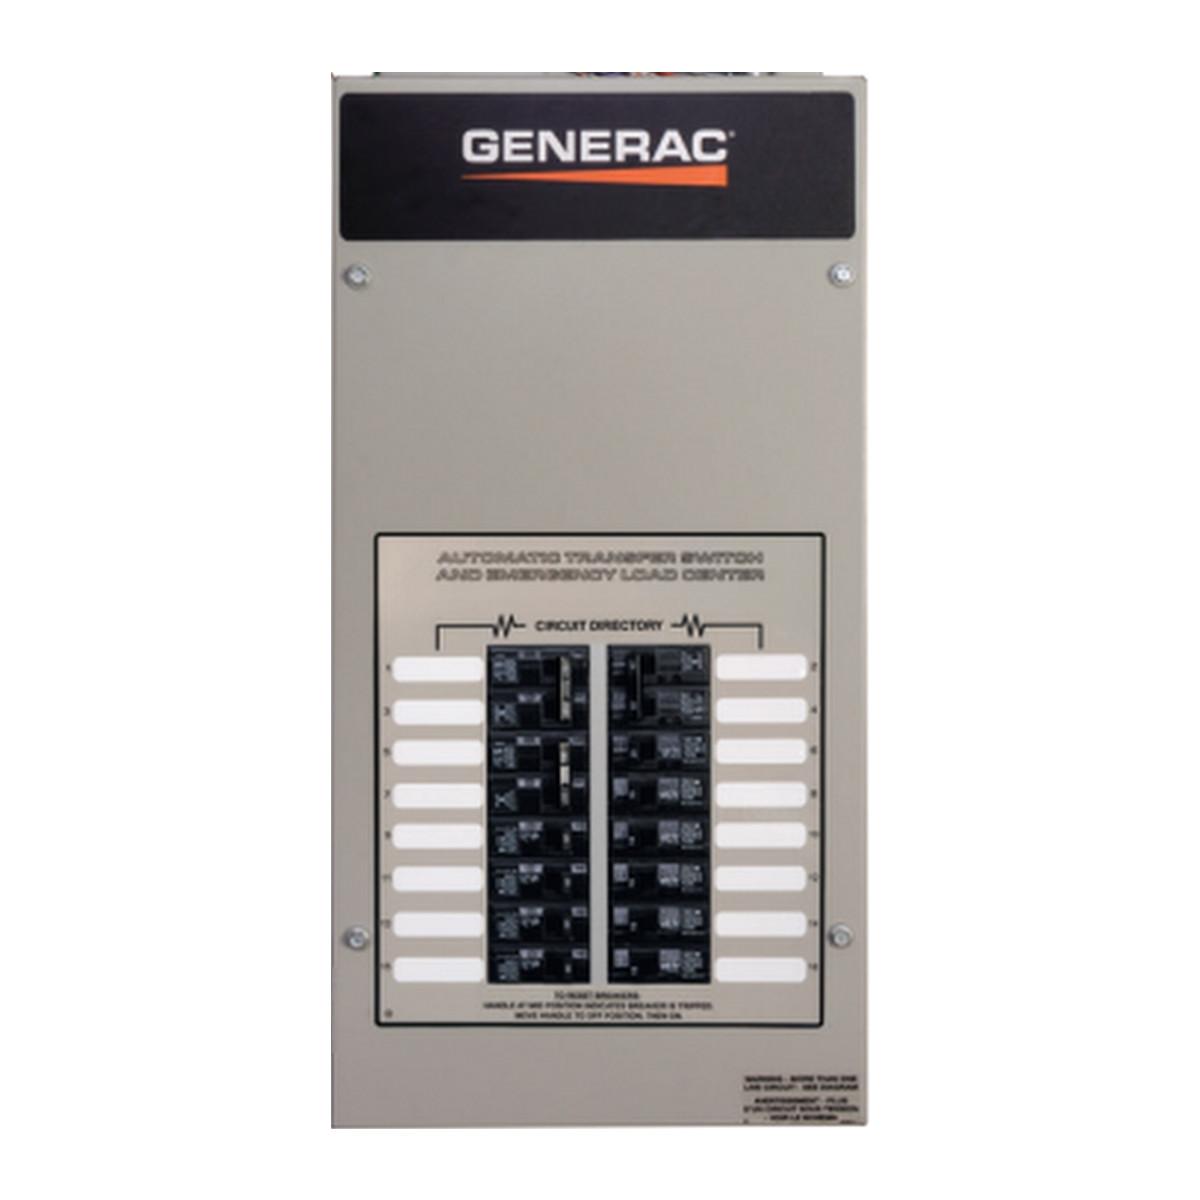 generac rxg10eza1 50a 1� 120 240v nema 1 automatic transfer switch with 10 circuit load center Relay Switch Wiring Diagram